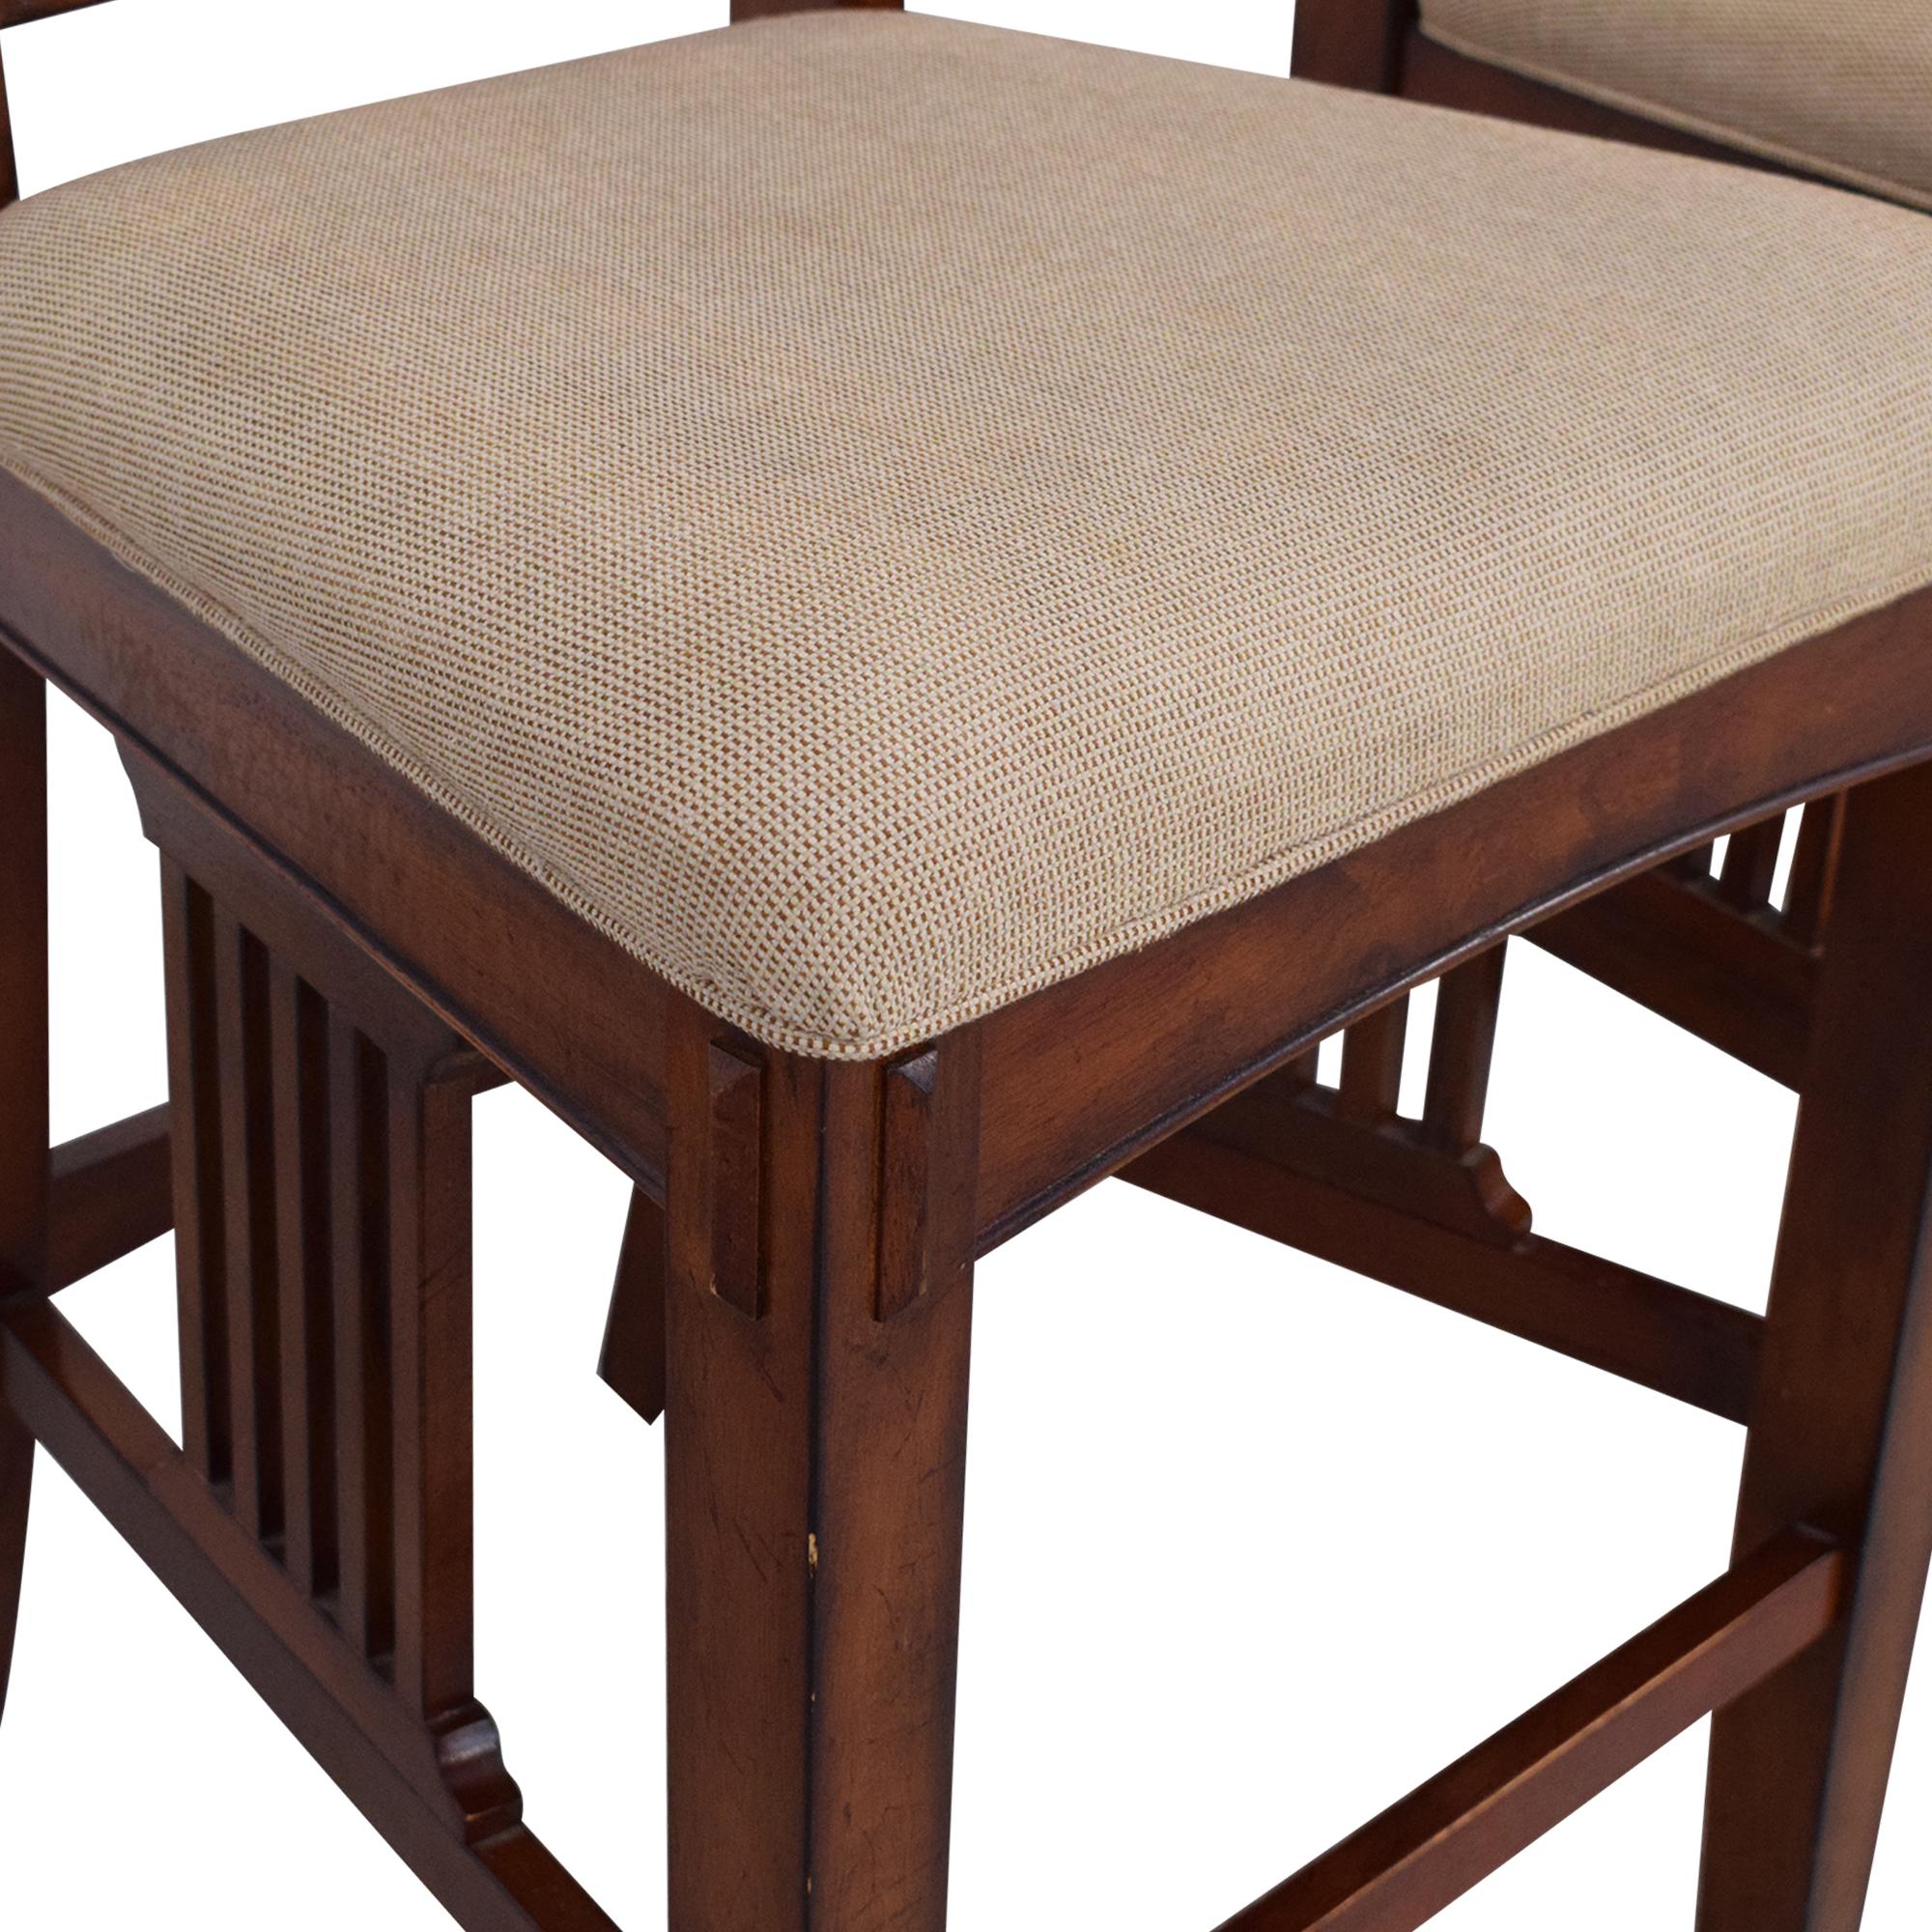 Broyhill Furniture Broyhill Vantana Upholstered Chairs brown